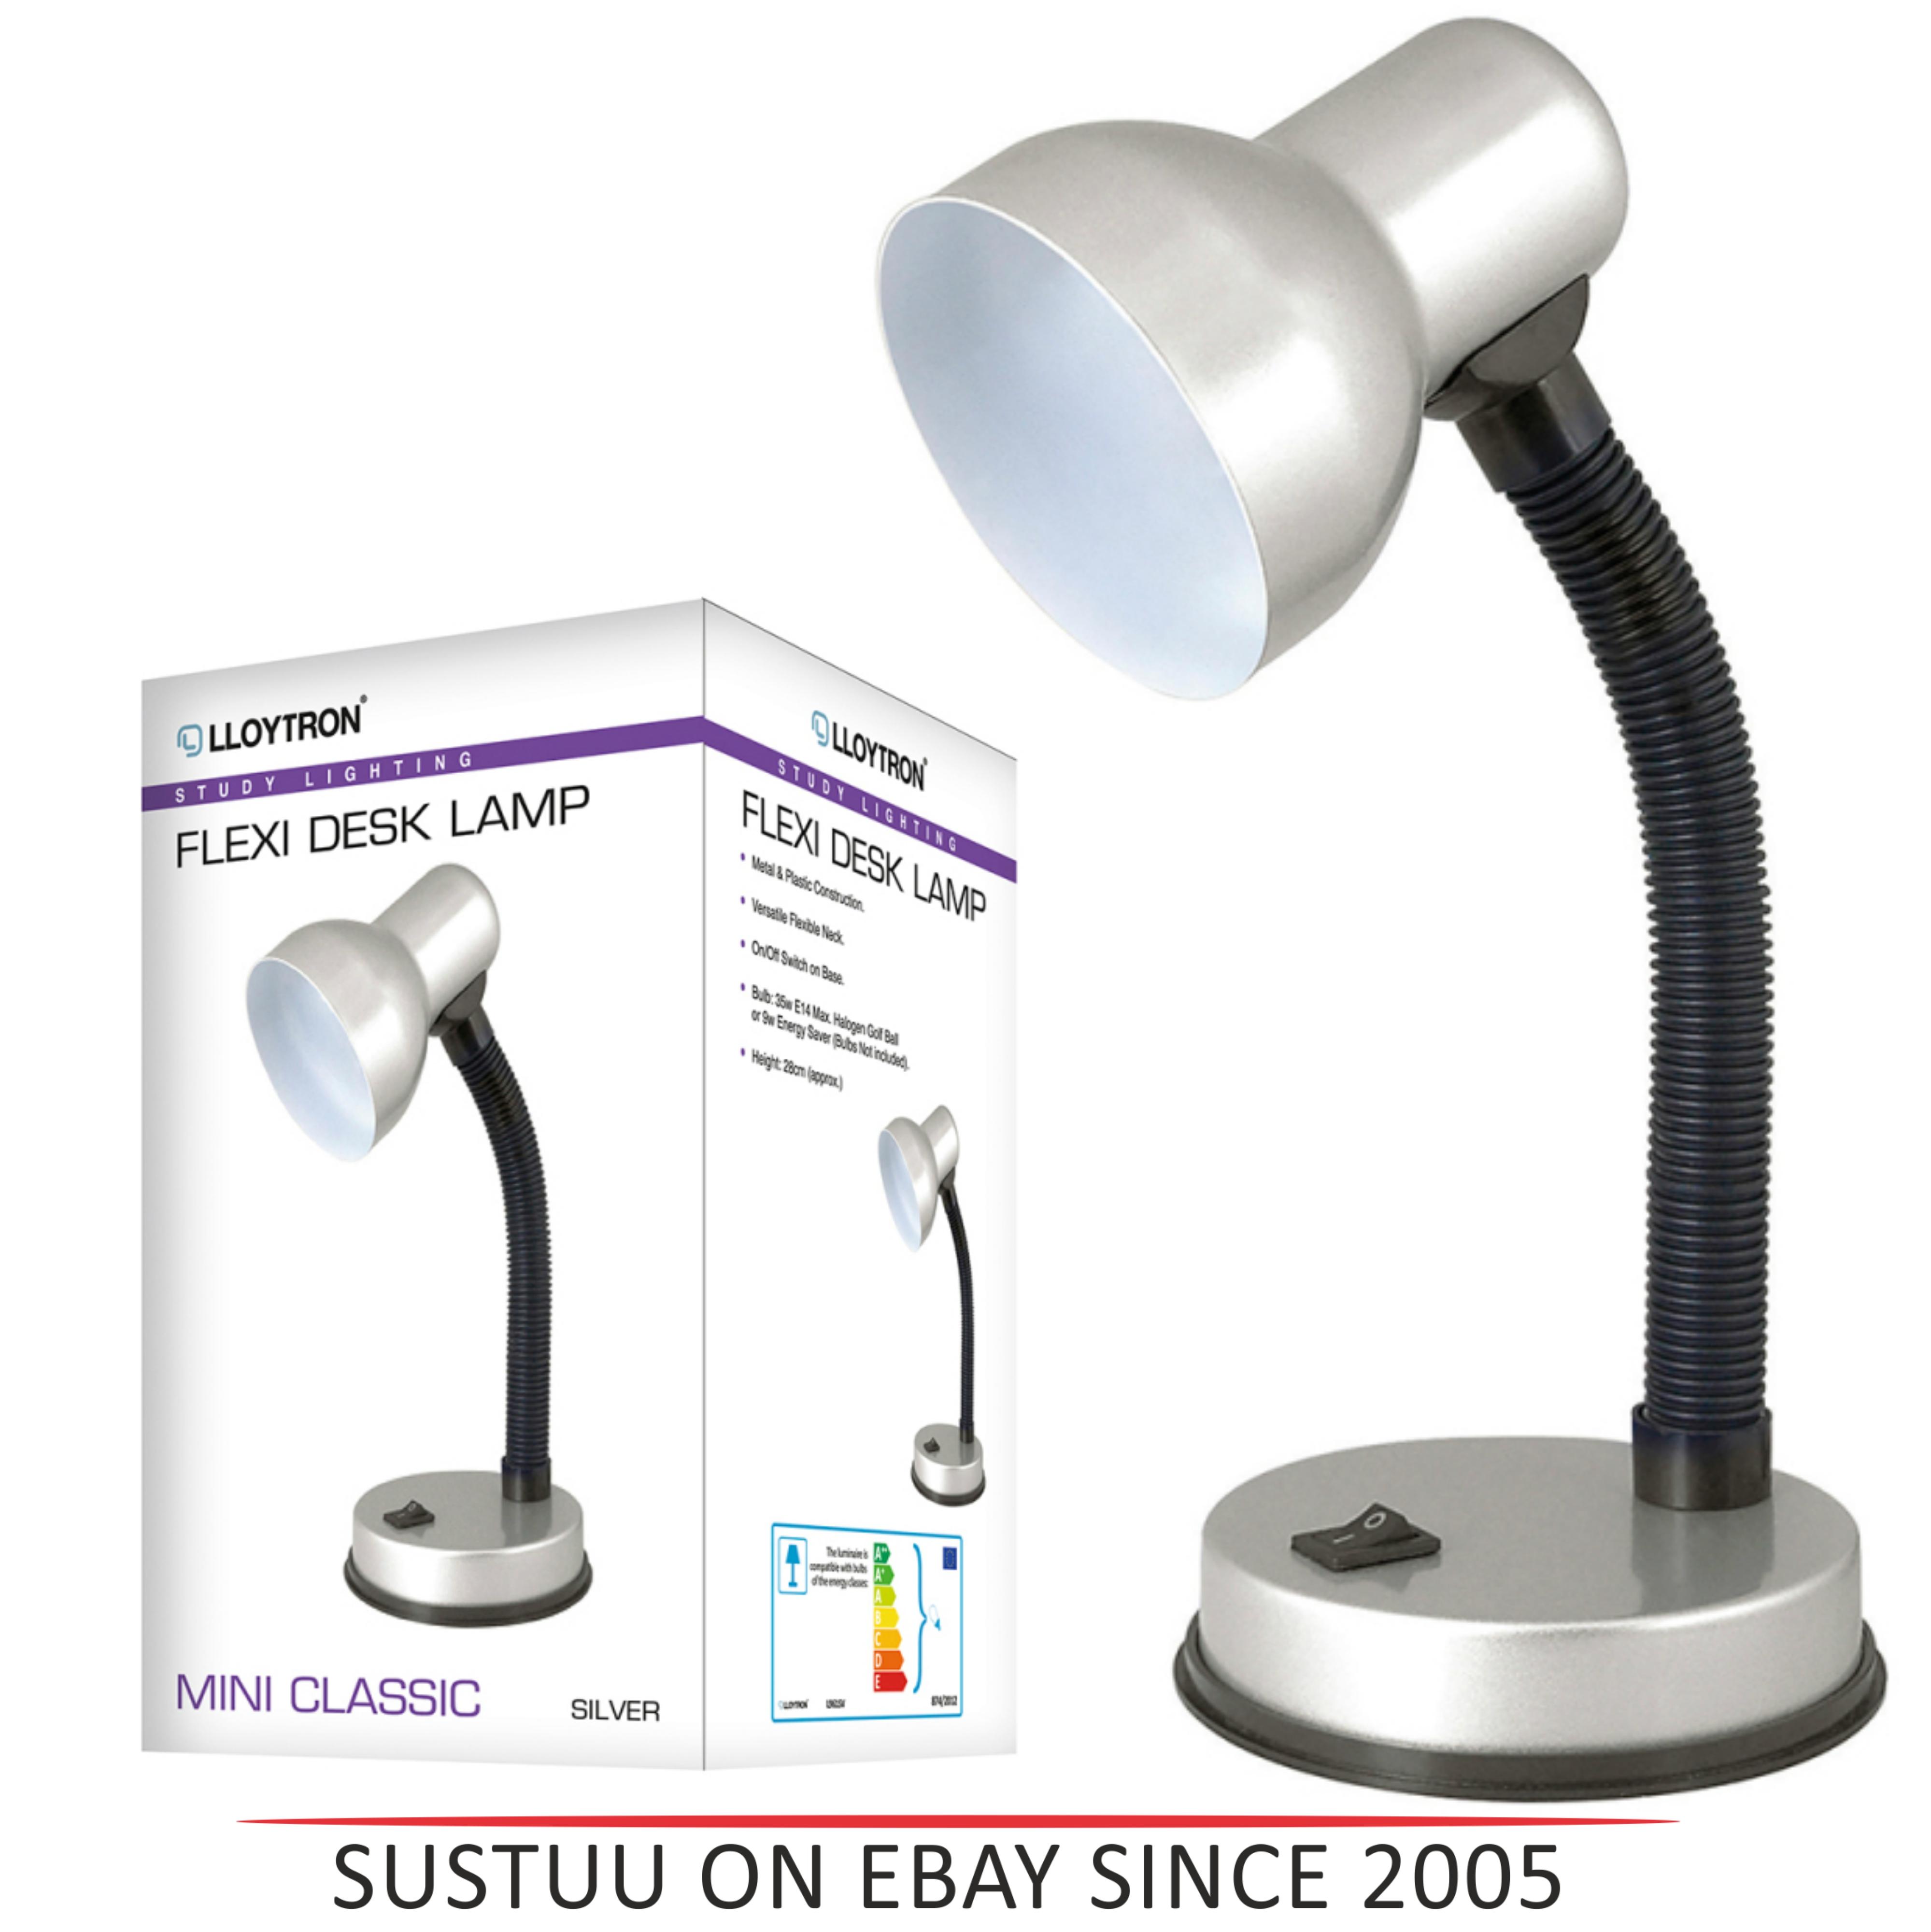 Lloytron  L961SV Flexi Desk Lamp / Mini Classic / Study Lighting / - Silver